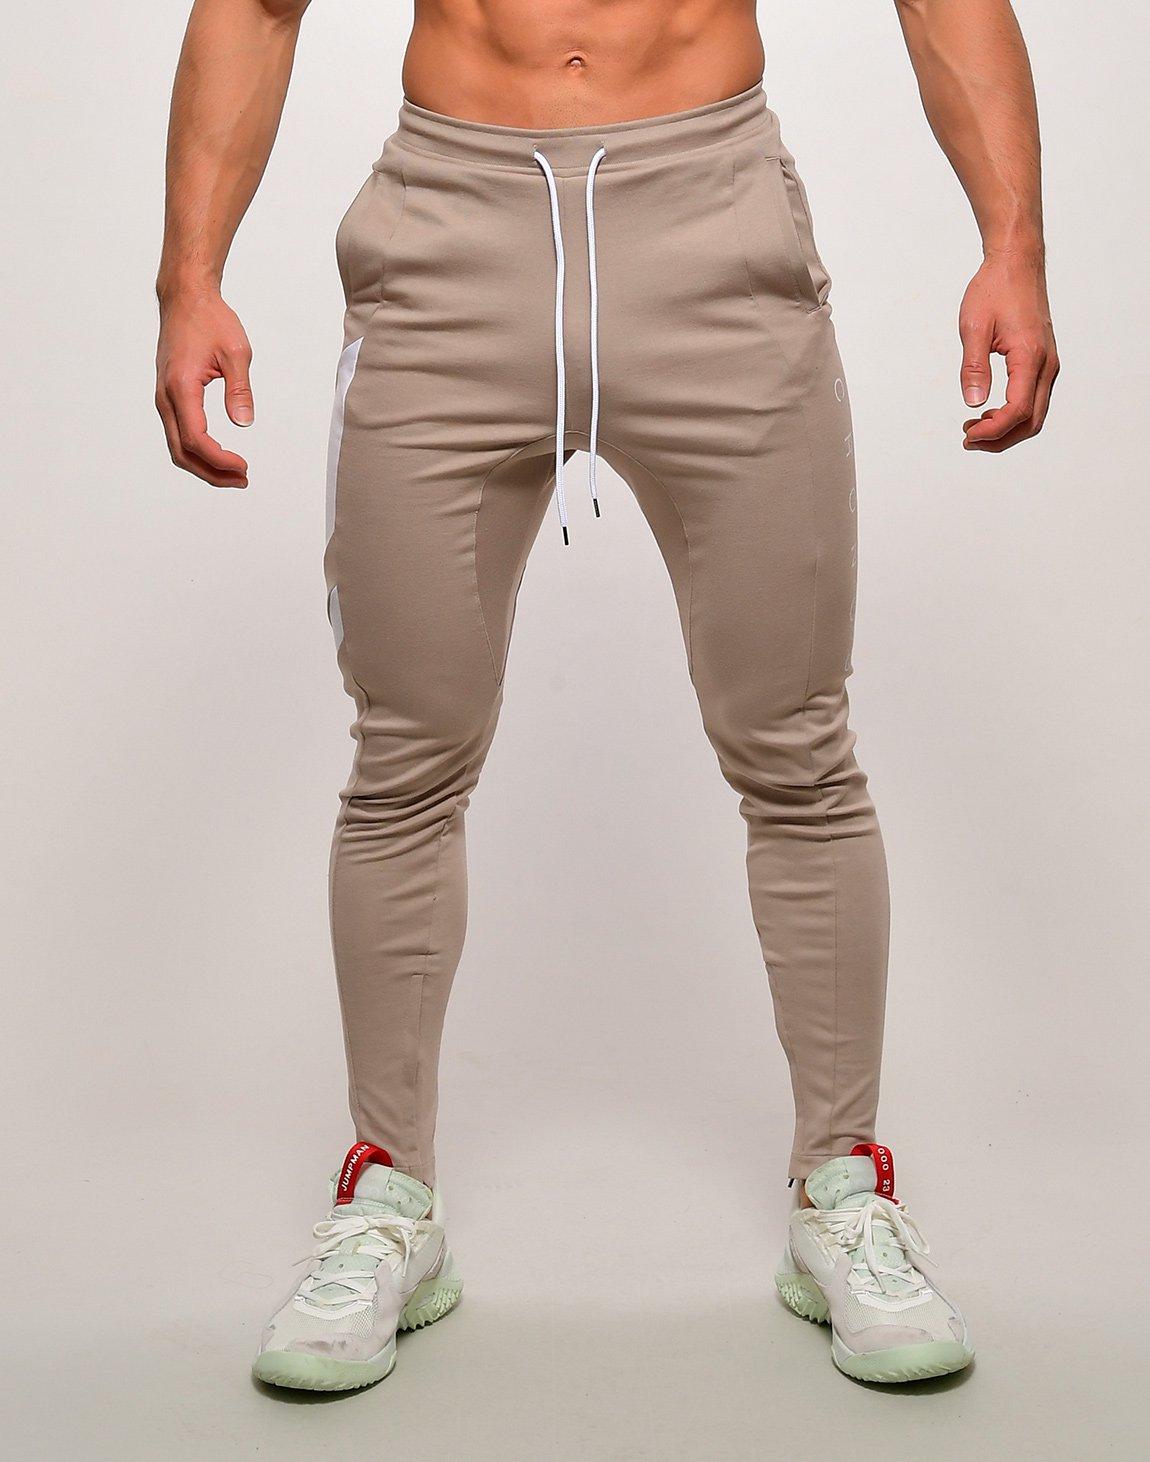 CRONOS SLANTED LINE PANTS【BEIGE】